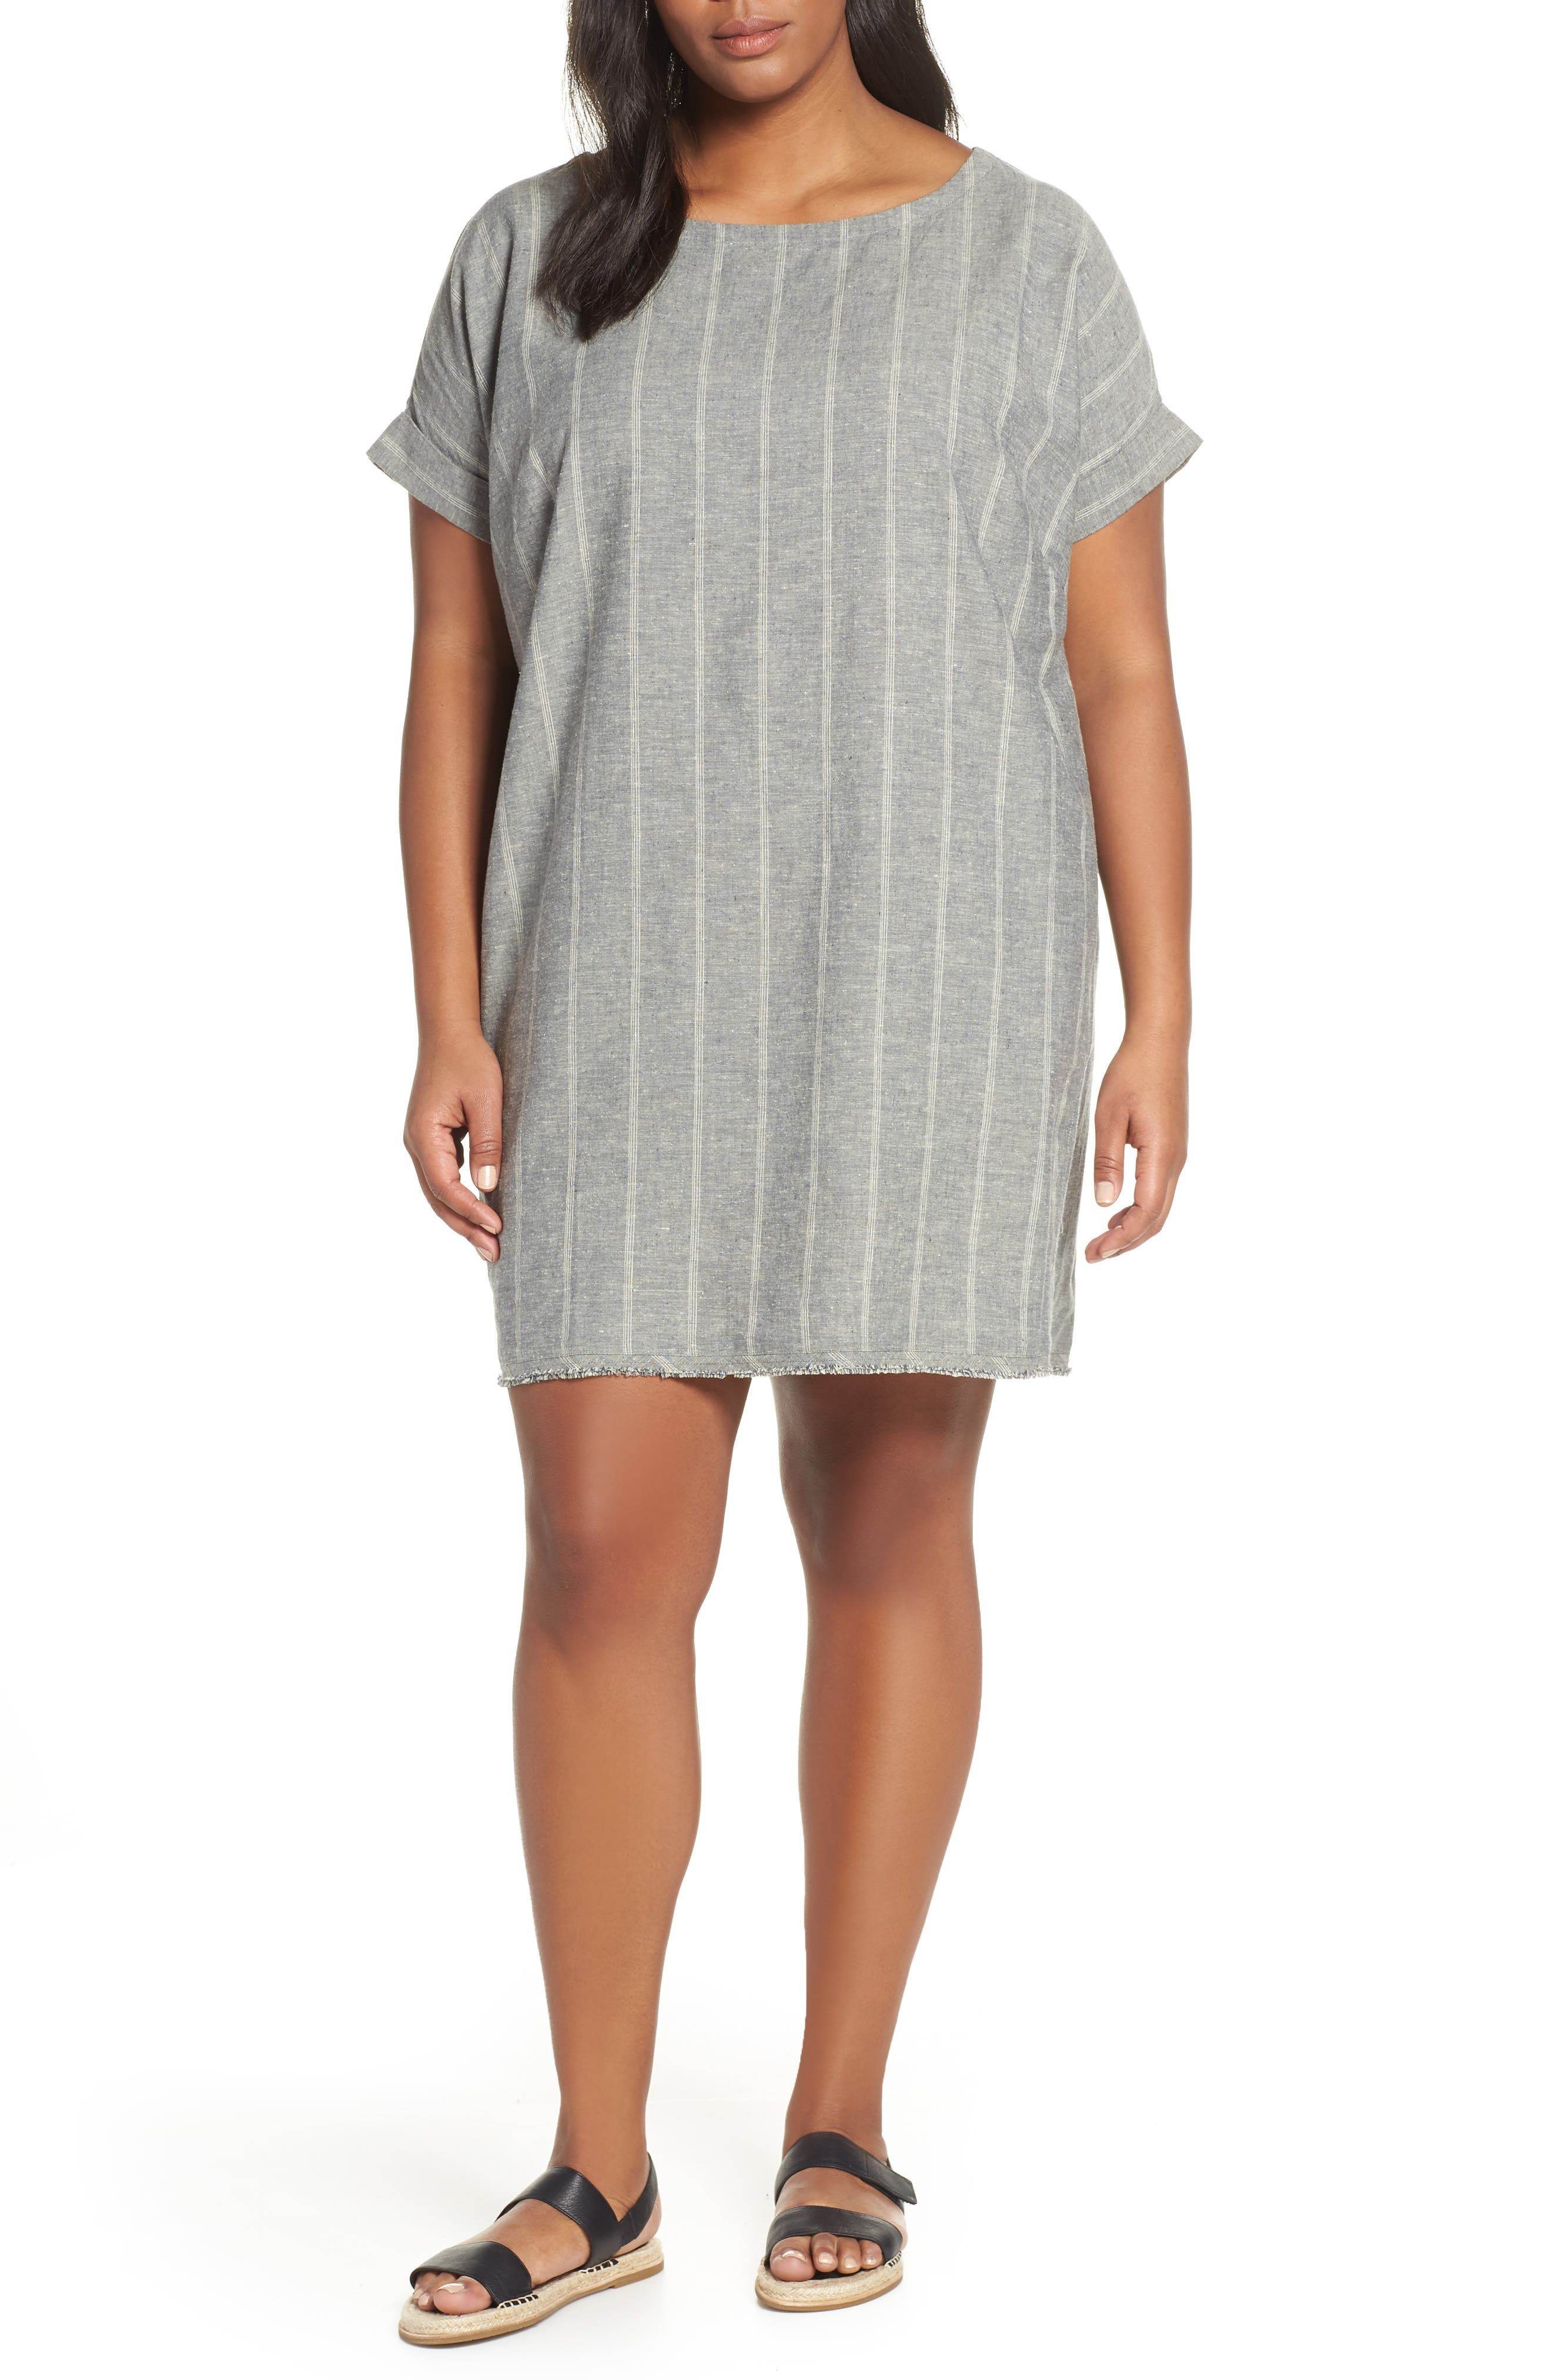 EILEEN FISHER Stripe Hemp & Organic Cotton Shift Dress, Main, color, MOON